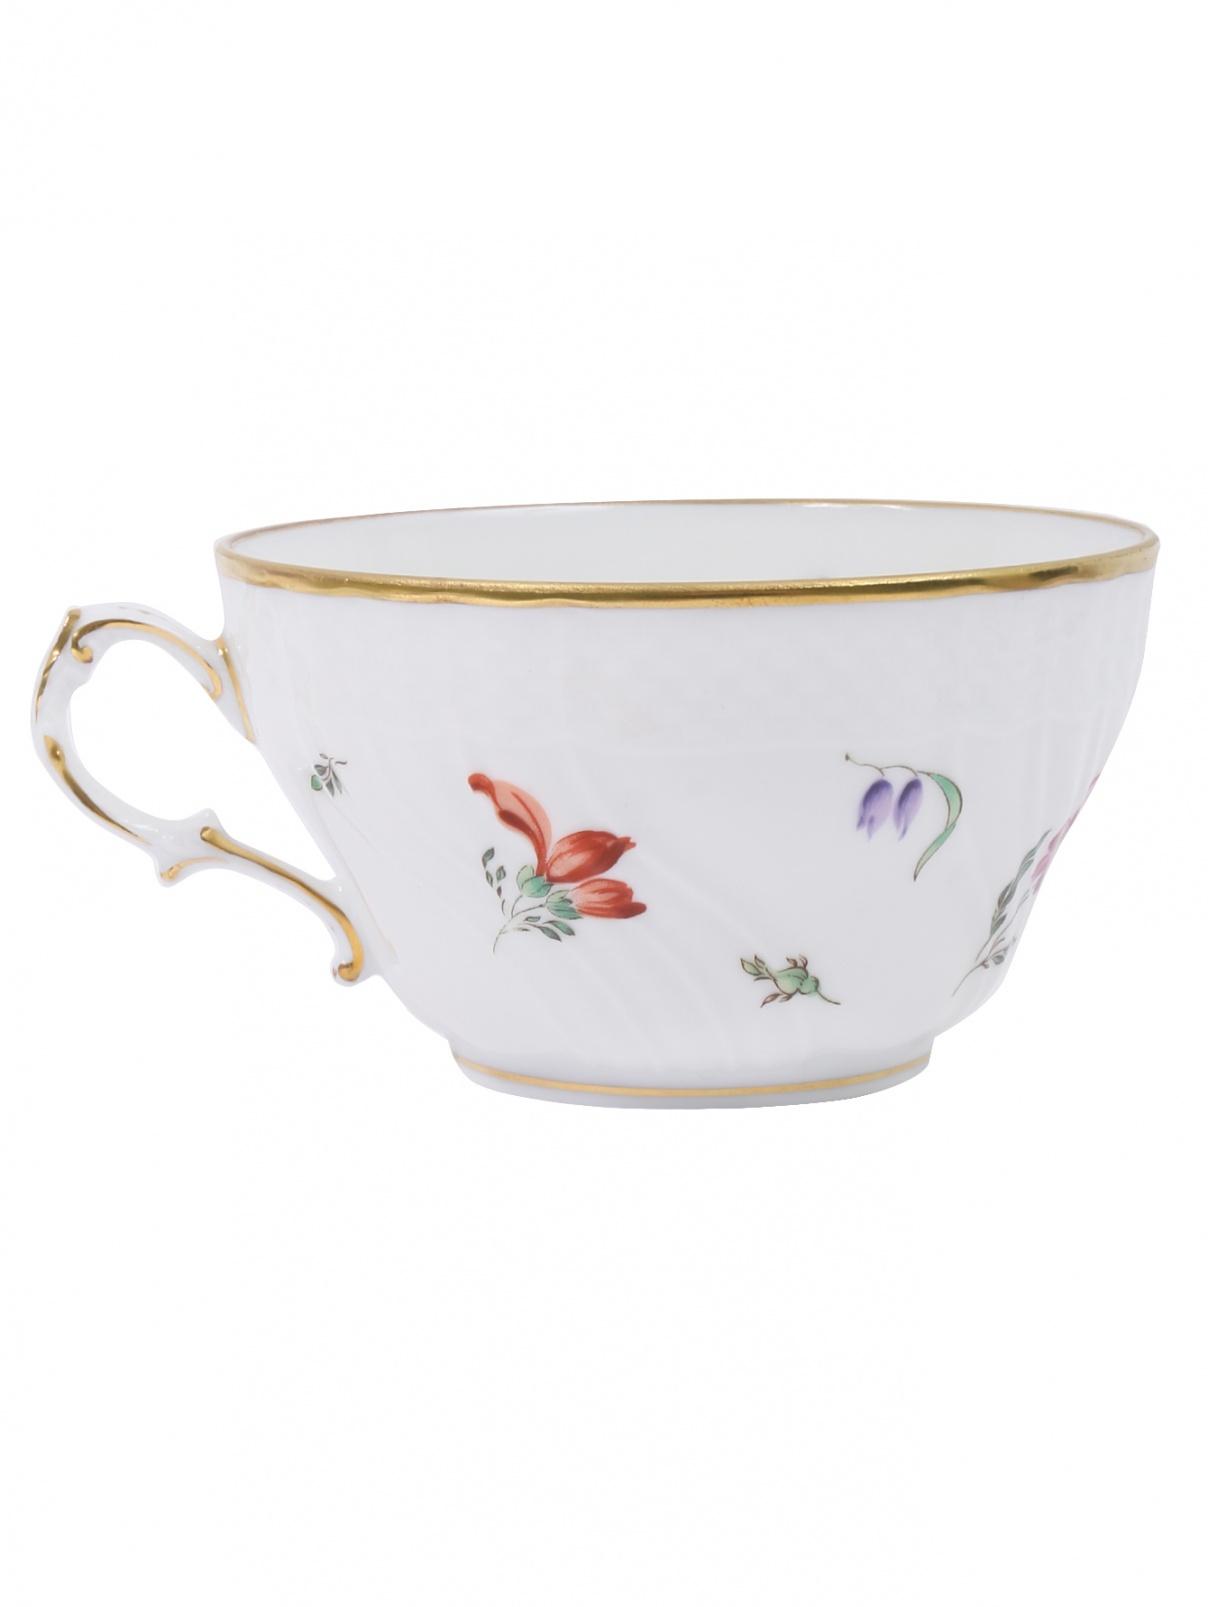 Чайная чашка из фарфора с узором Richard Ginori 1735  –  Общий вид